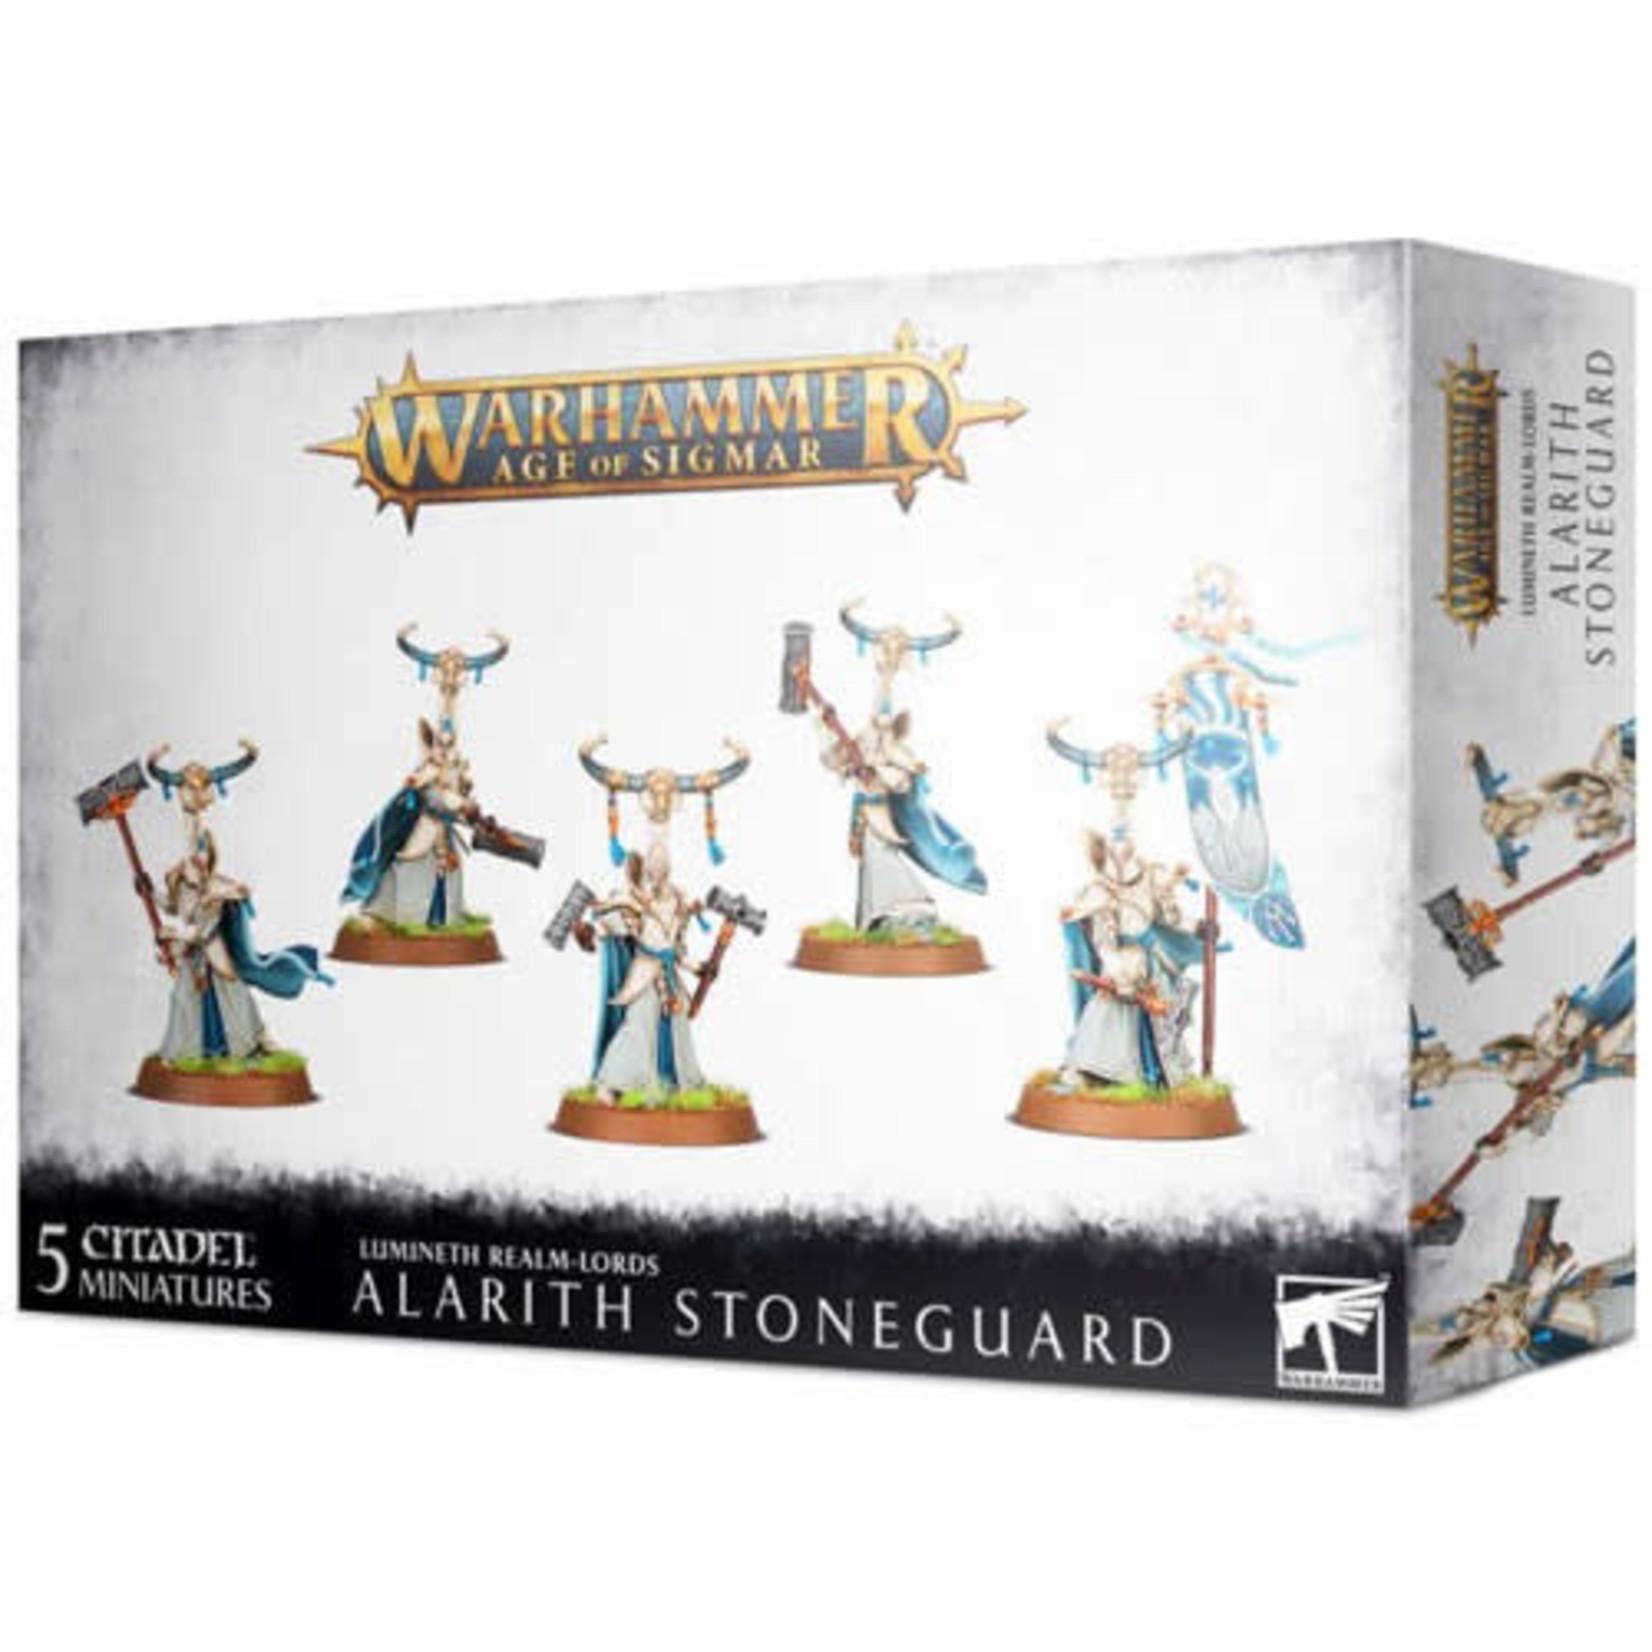 Lumineth Realm Lords Alarith Stoneguard (AOS)